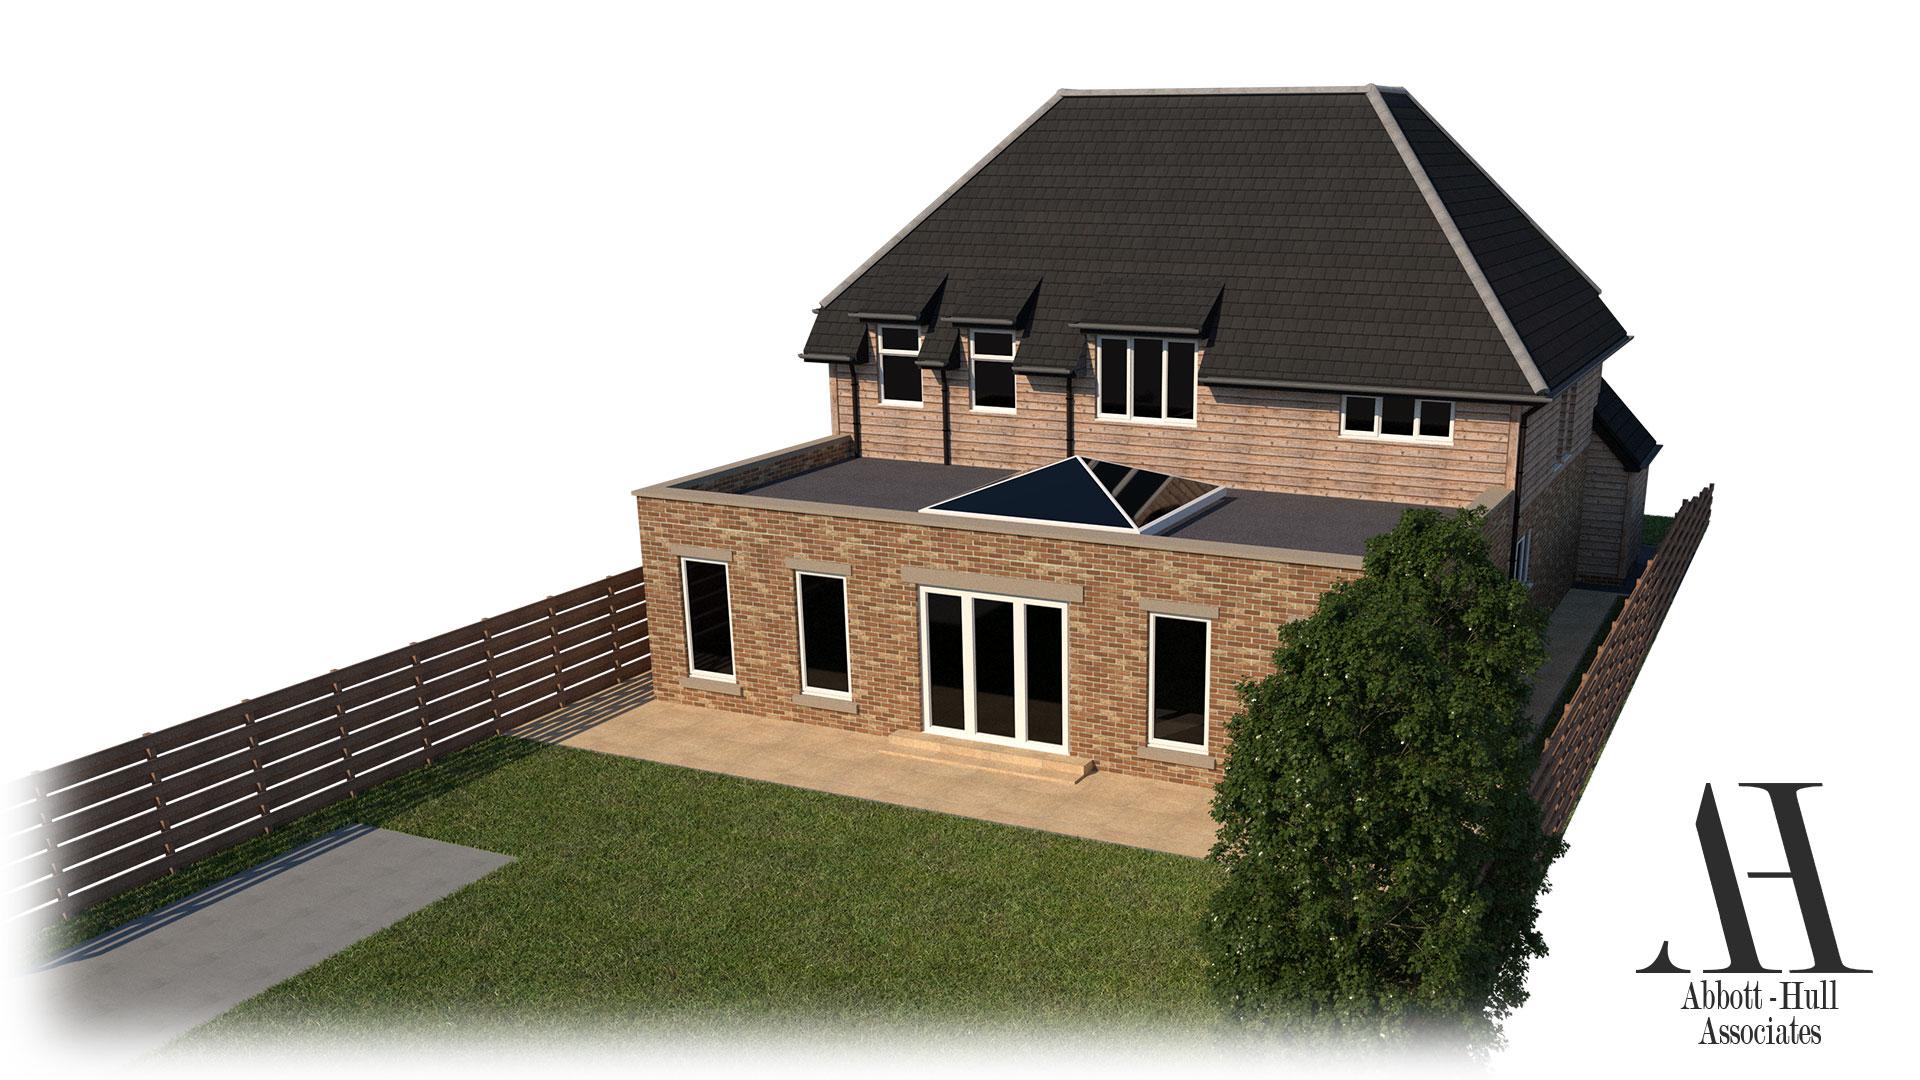 The Grove, Thornton-Cleveleys, House Renovation Visual D